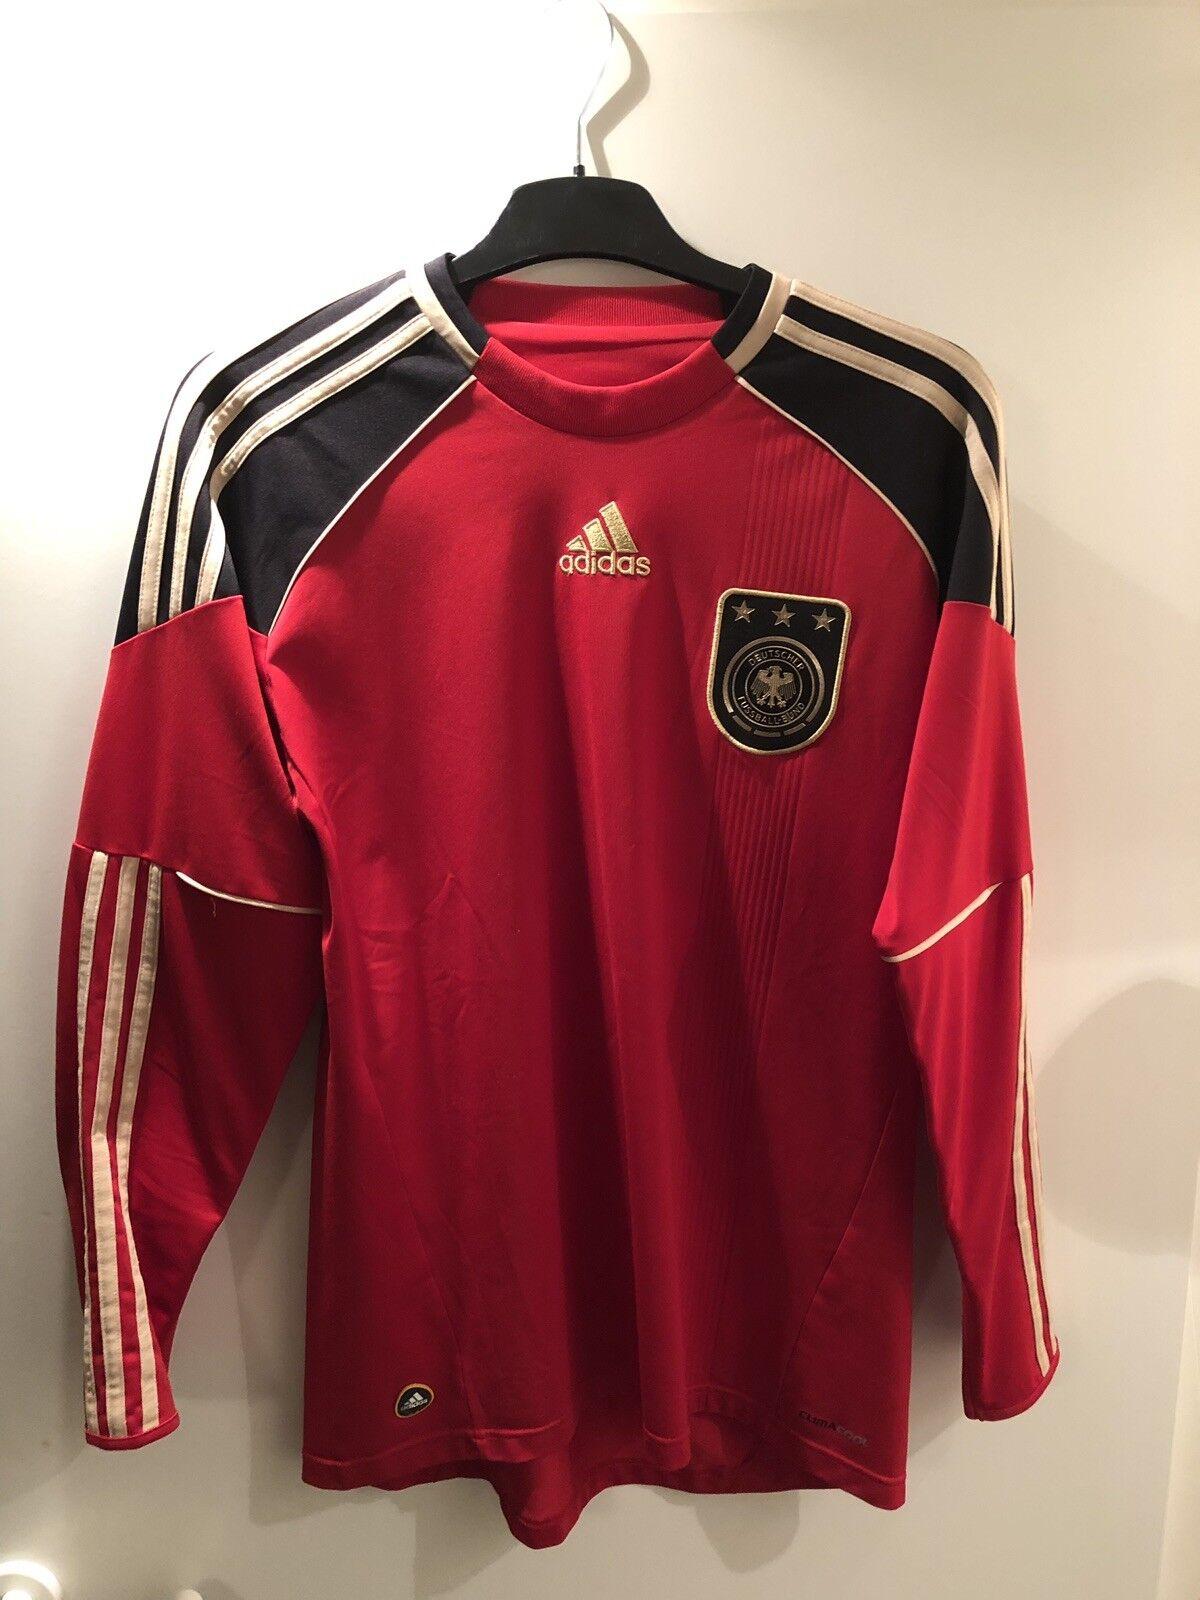 Deutschland Trikot 2010 Gr. 176 Adidas WM Jersey Home Home Home DFB EM Germany Torwart fd3f98